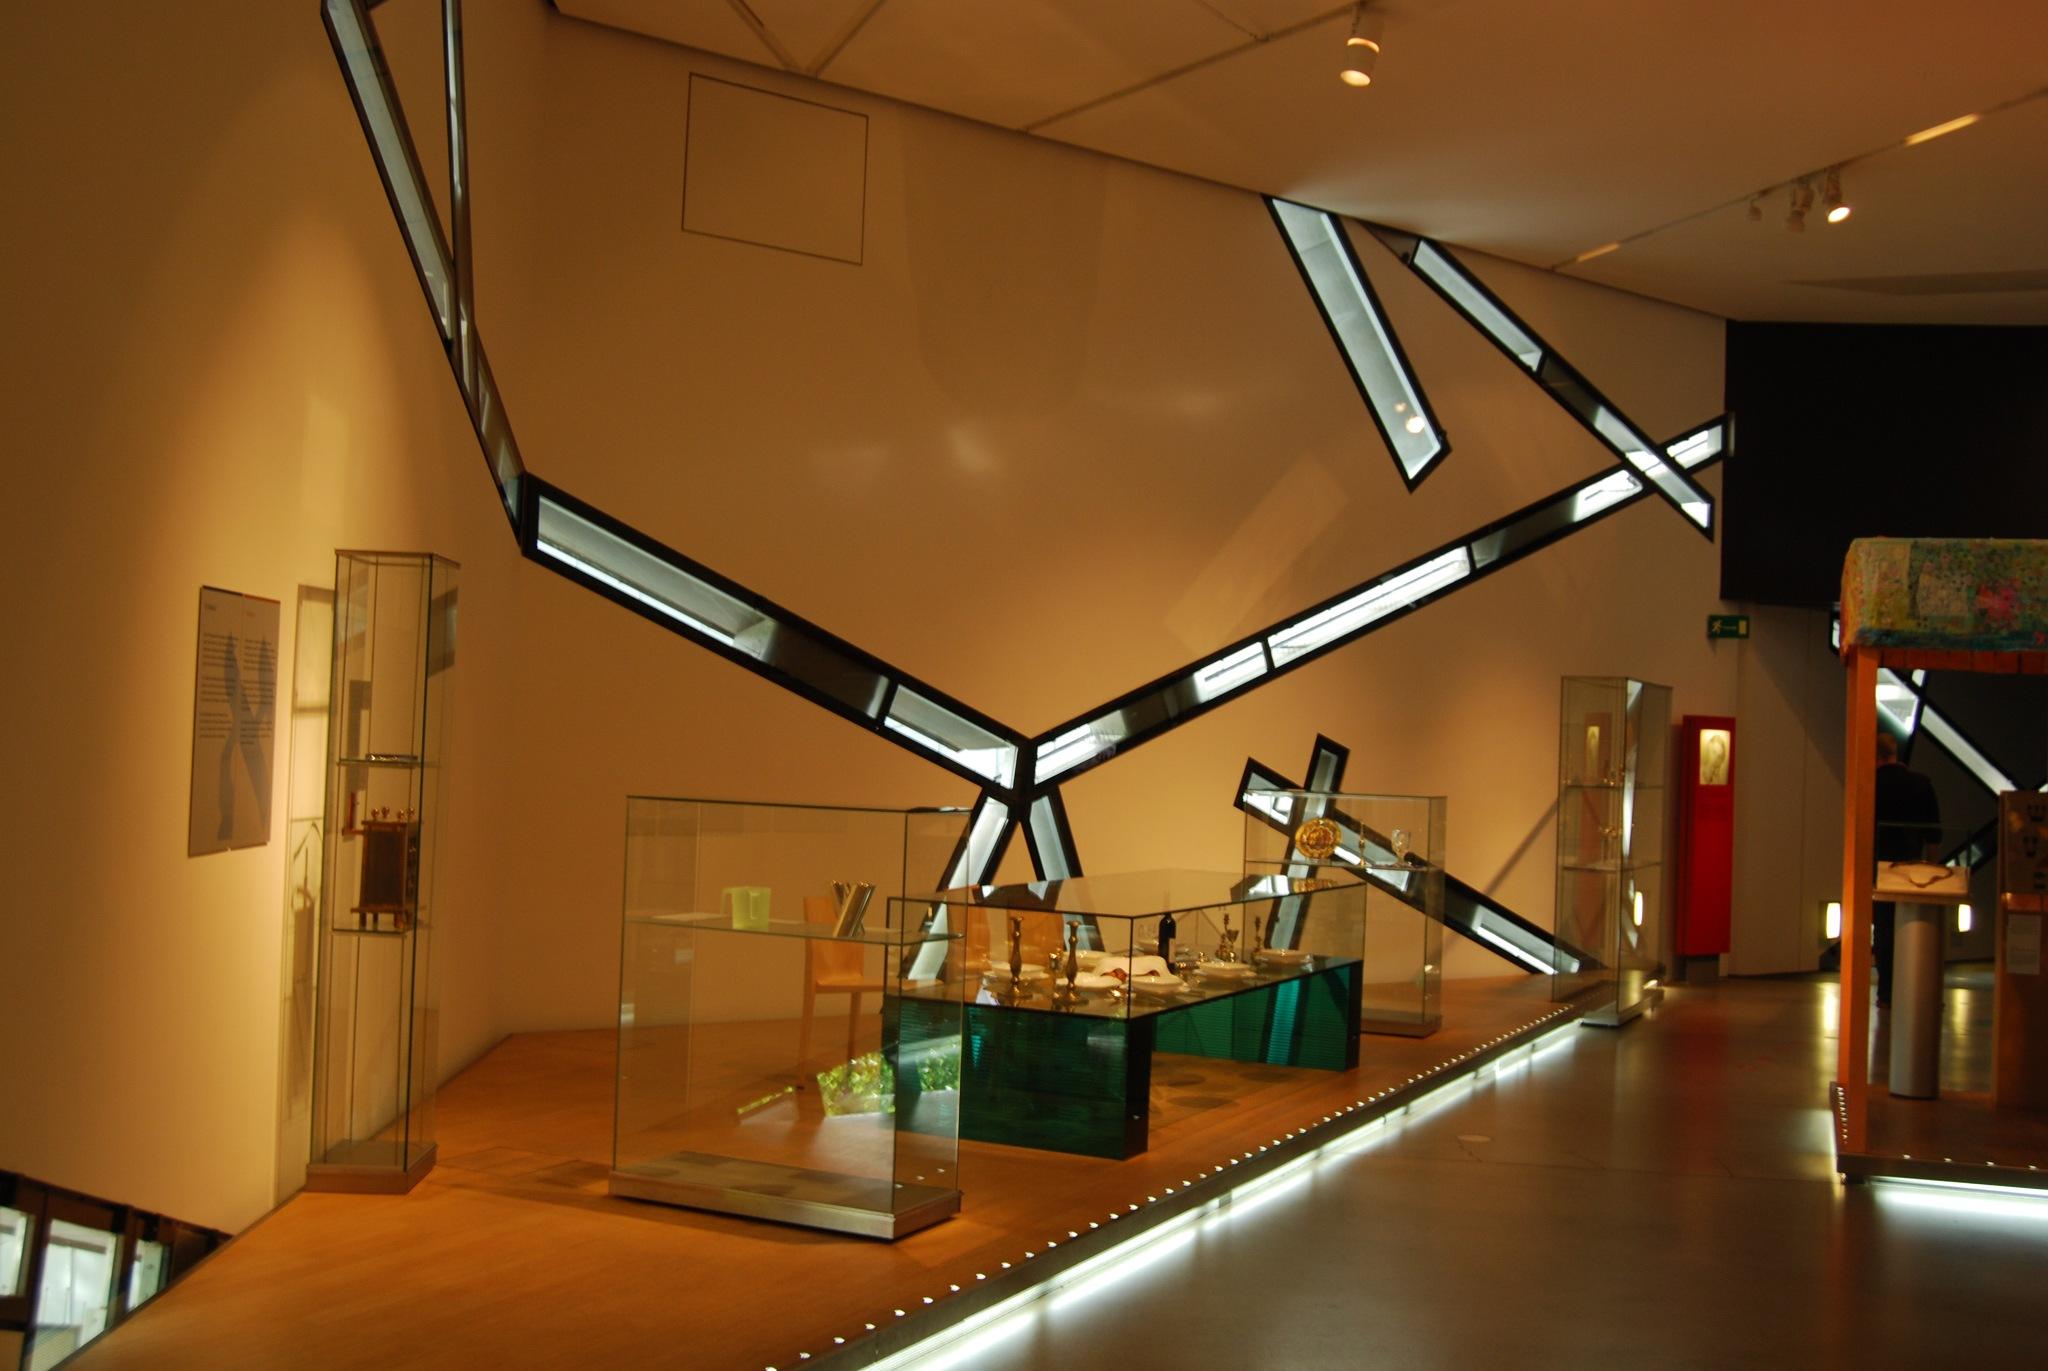 judisk  museumet berlin  by Max Cesare Parodi